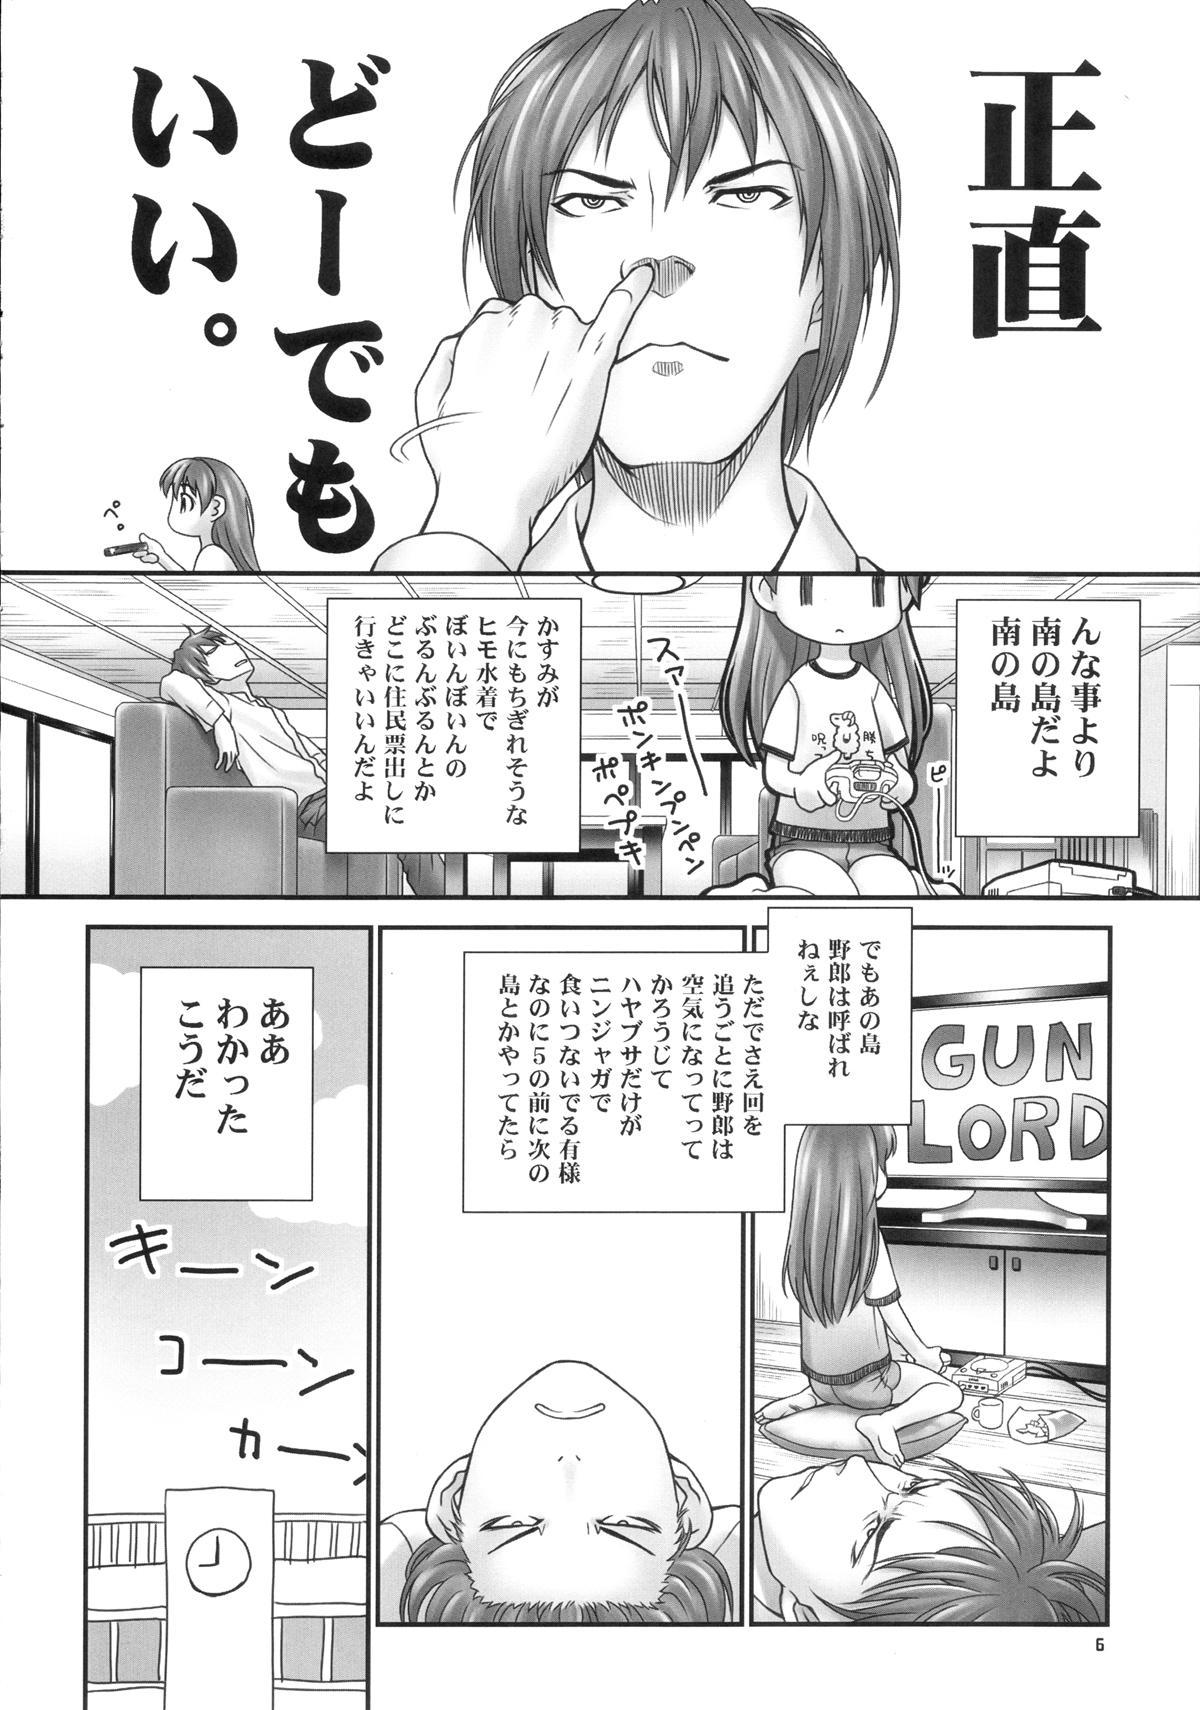 St. Dead or Alive Highschool - Love Love Kasumi Chan Teacher 4